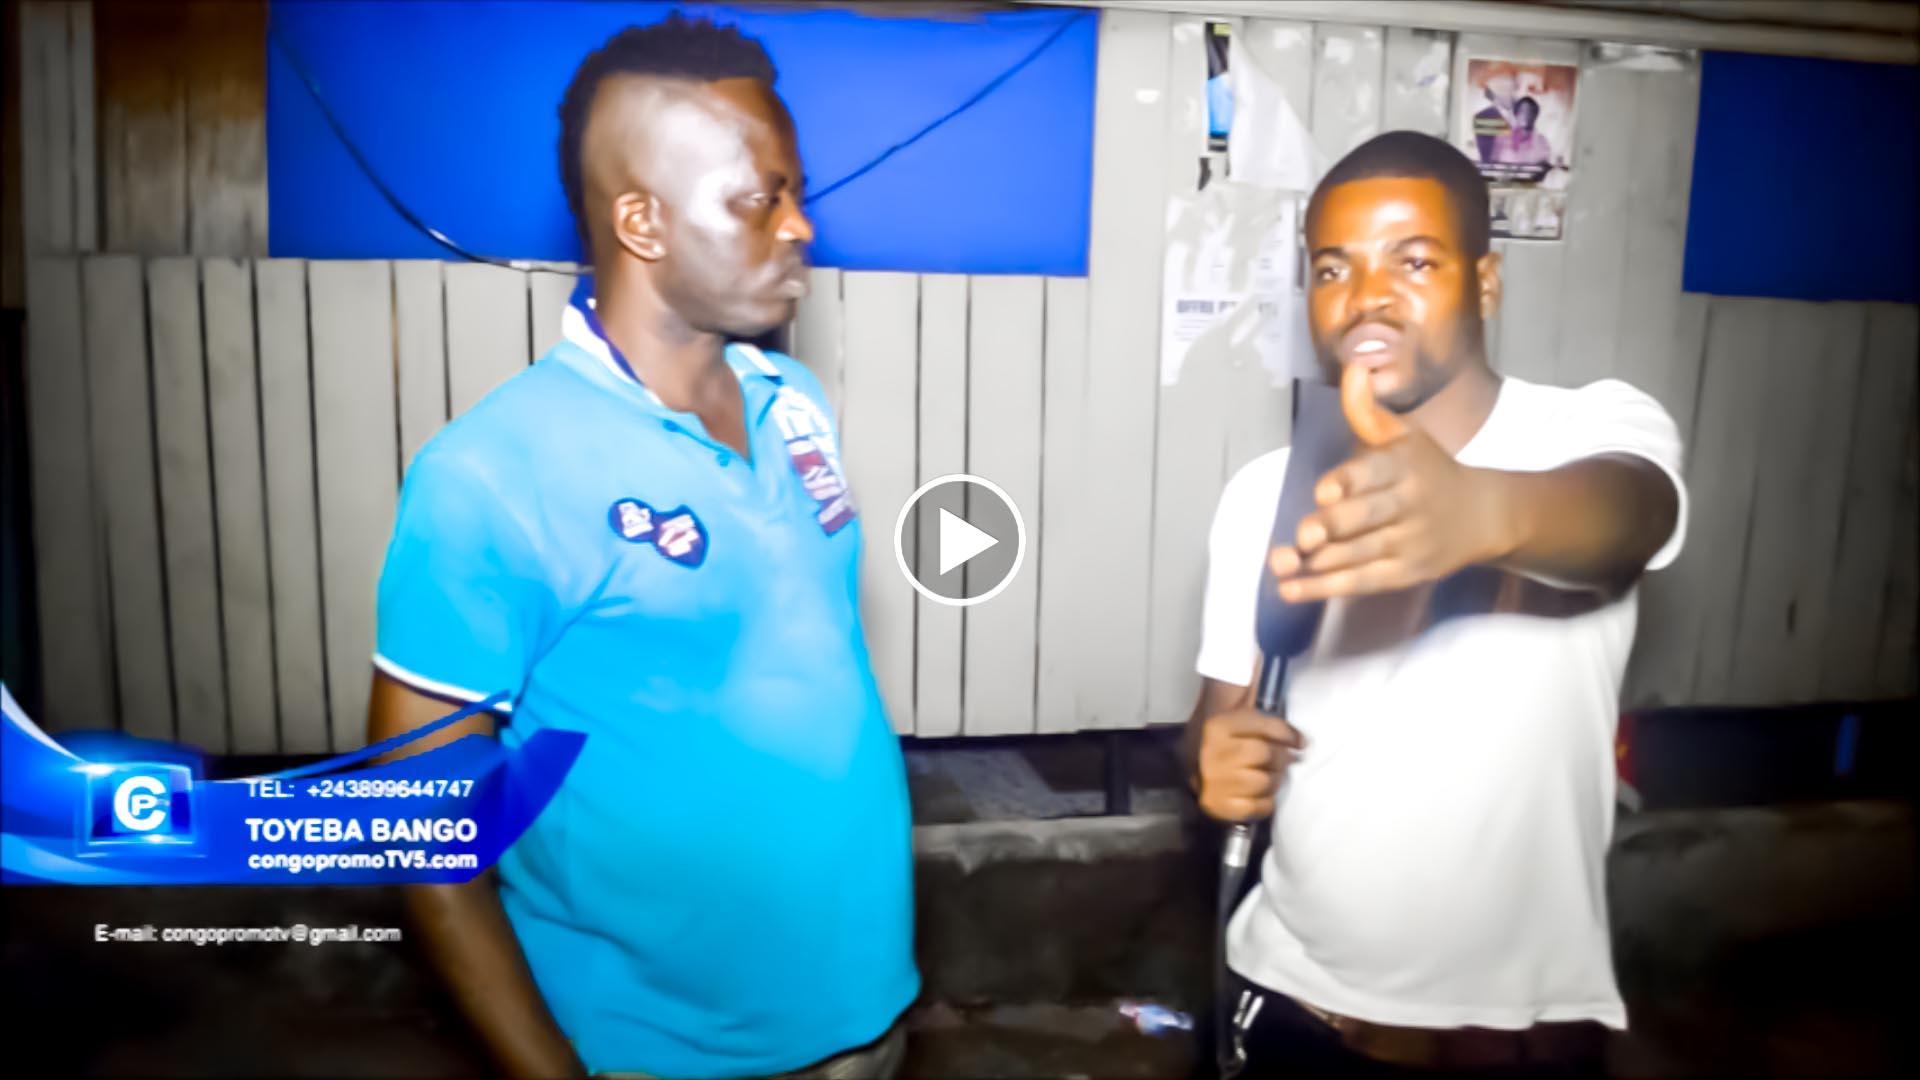 JB MPIANA Grand chanteur ya bcbg zulema apanzi ba kunga na ndenge ya mukete na micro ya Yves IPAN